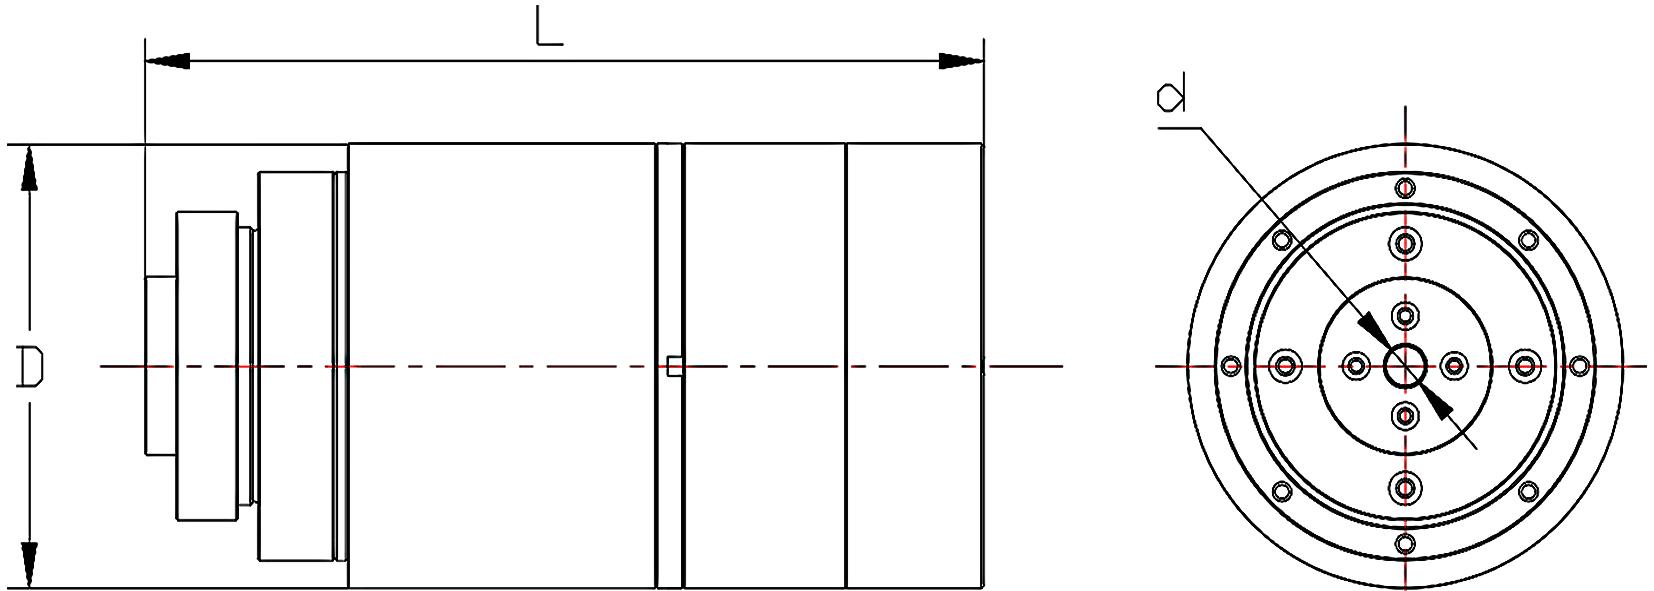 CJU一体化关节产品外形图